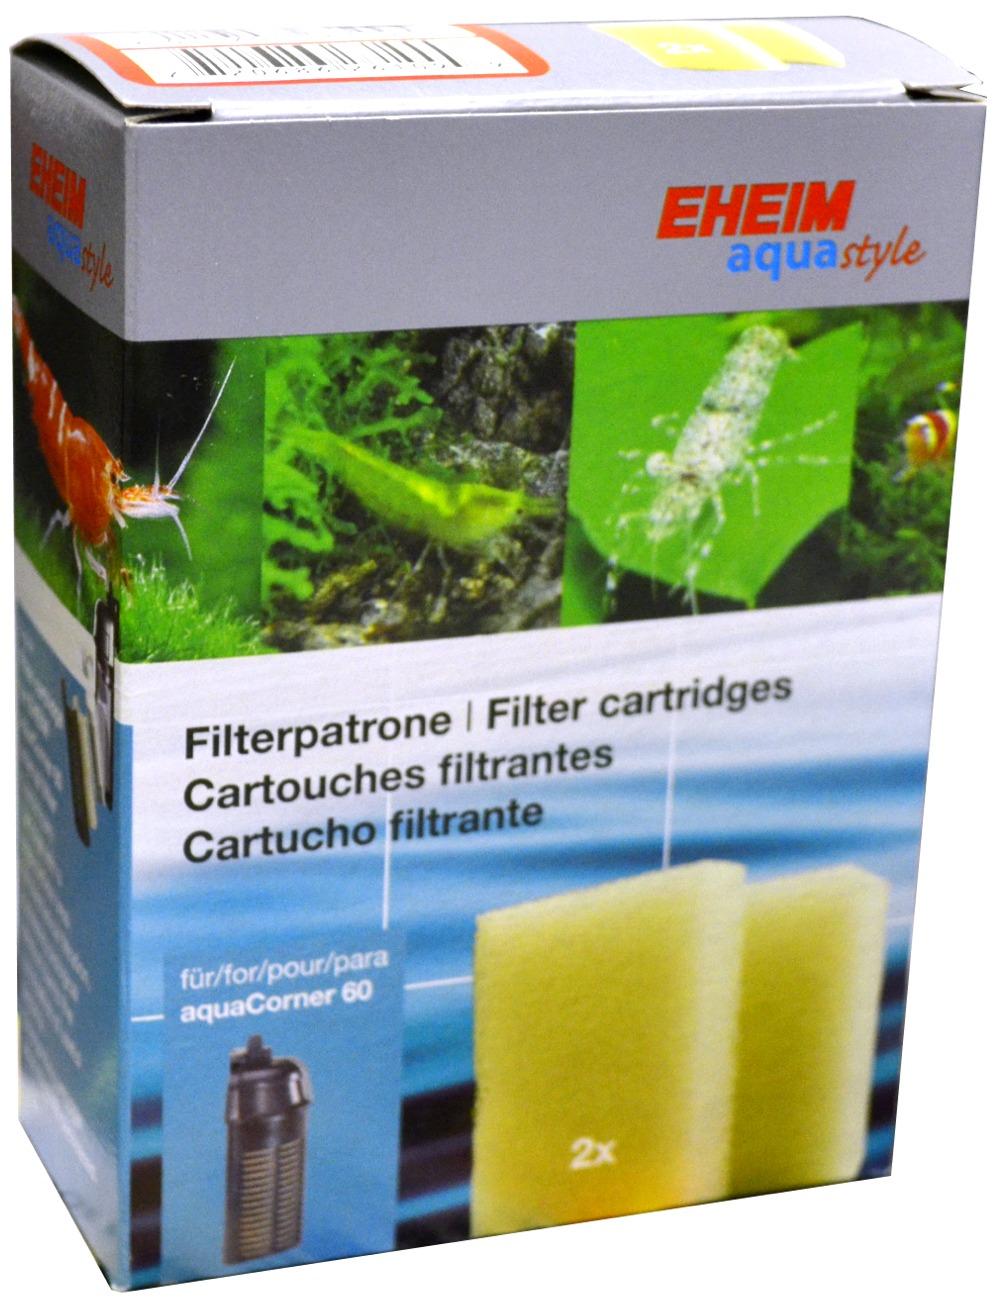 mousse-filtre-aquastyle-eheim